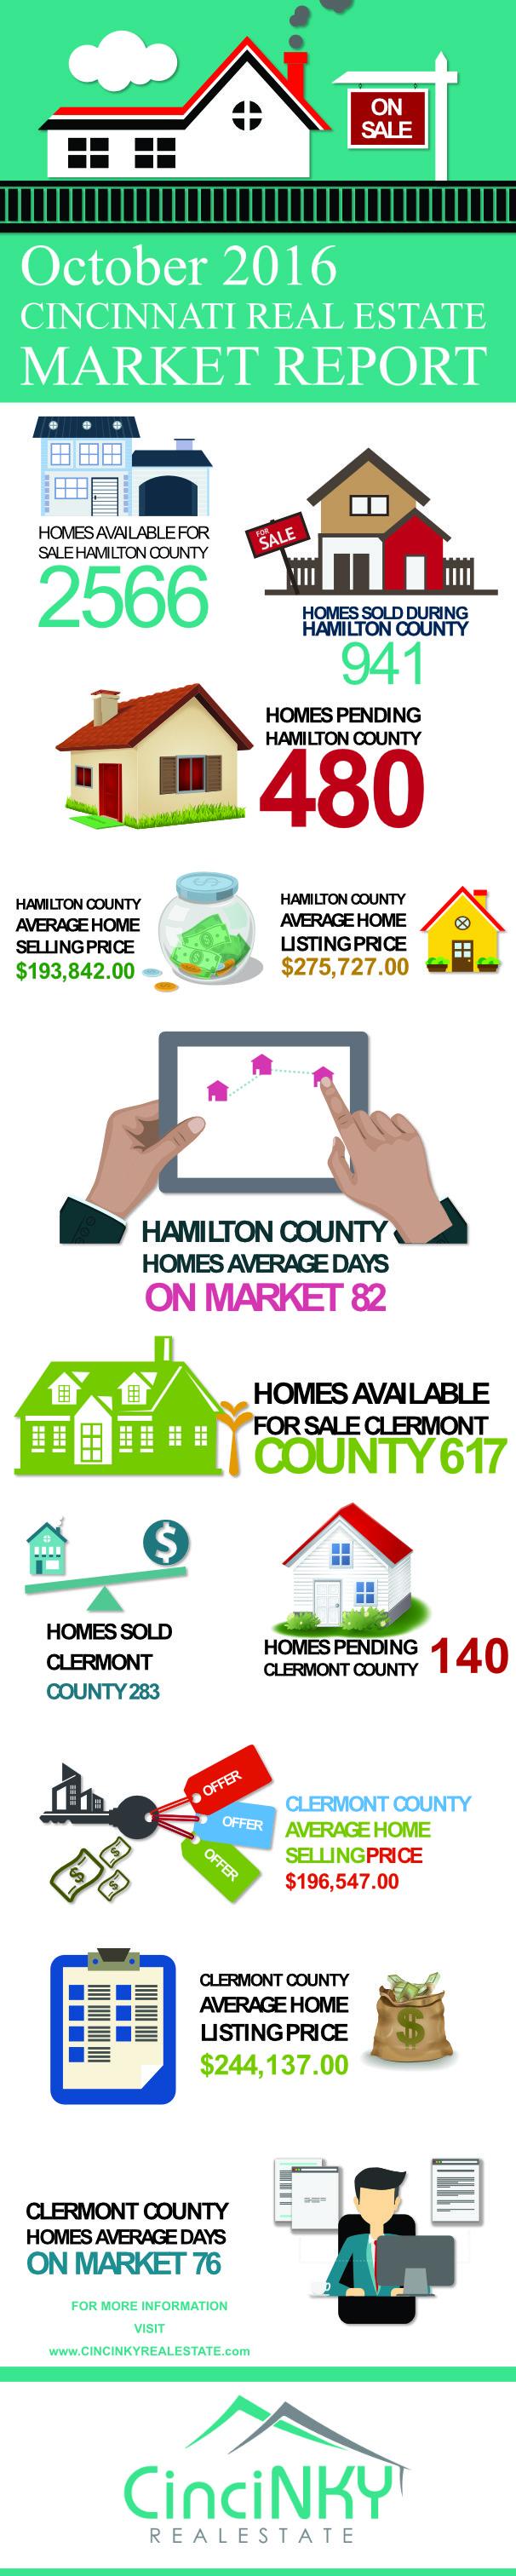 October 2016 Greater Cincinnati Real Estate Market Report Infographic